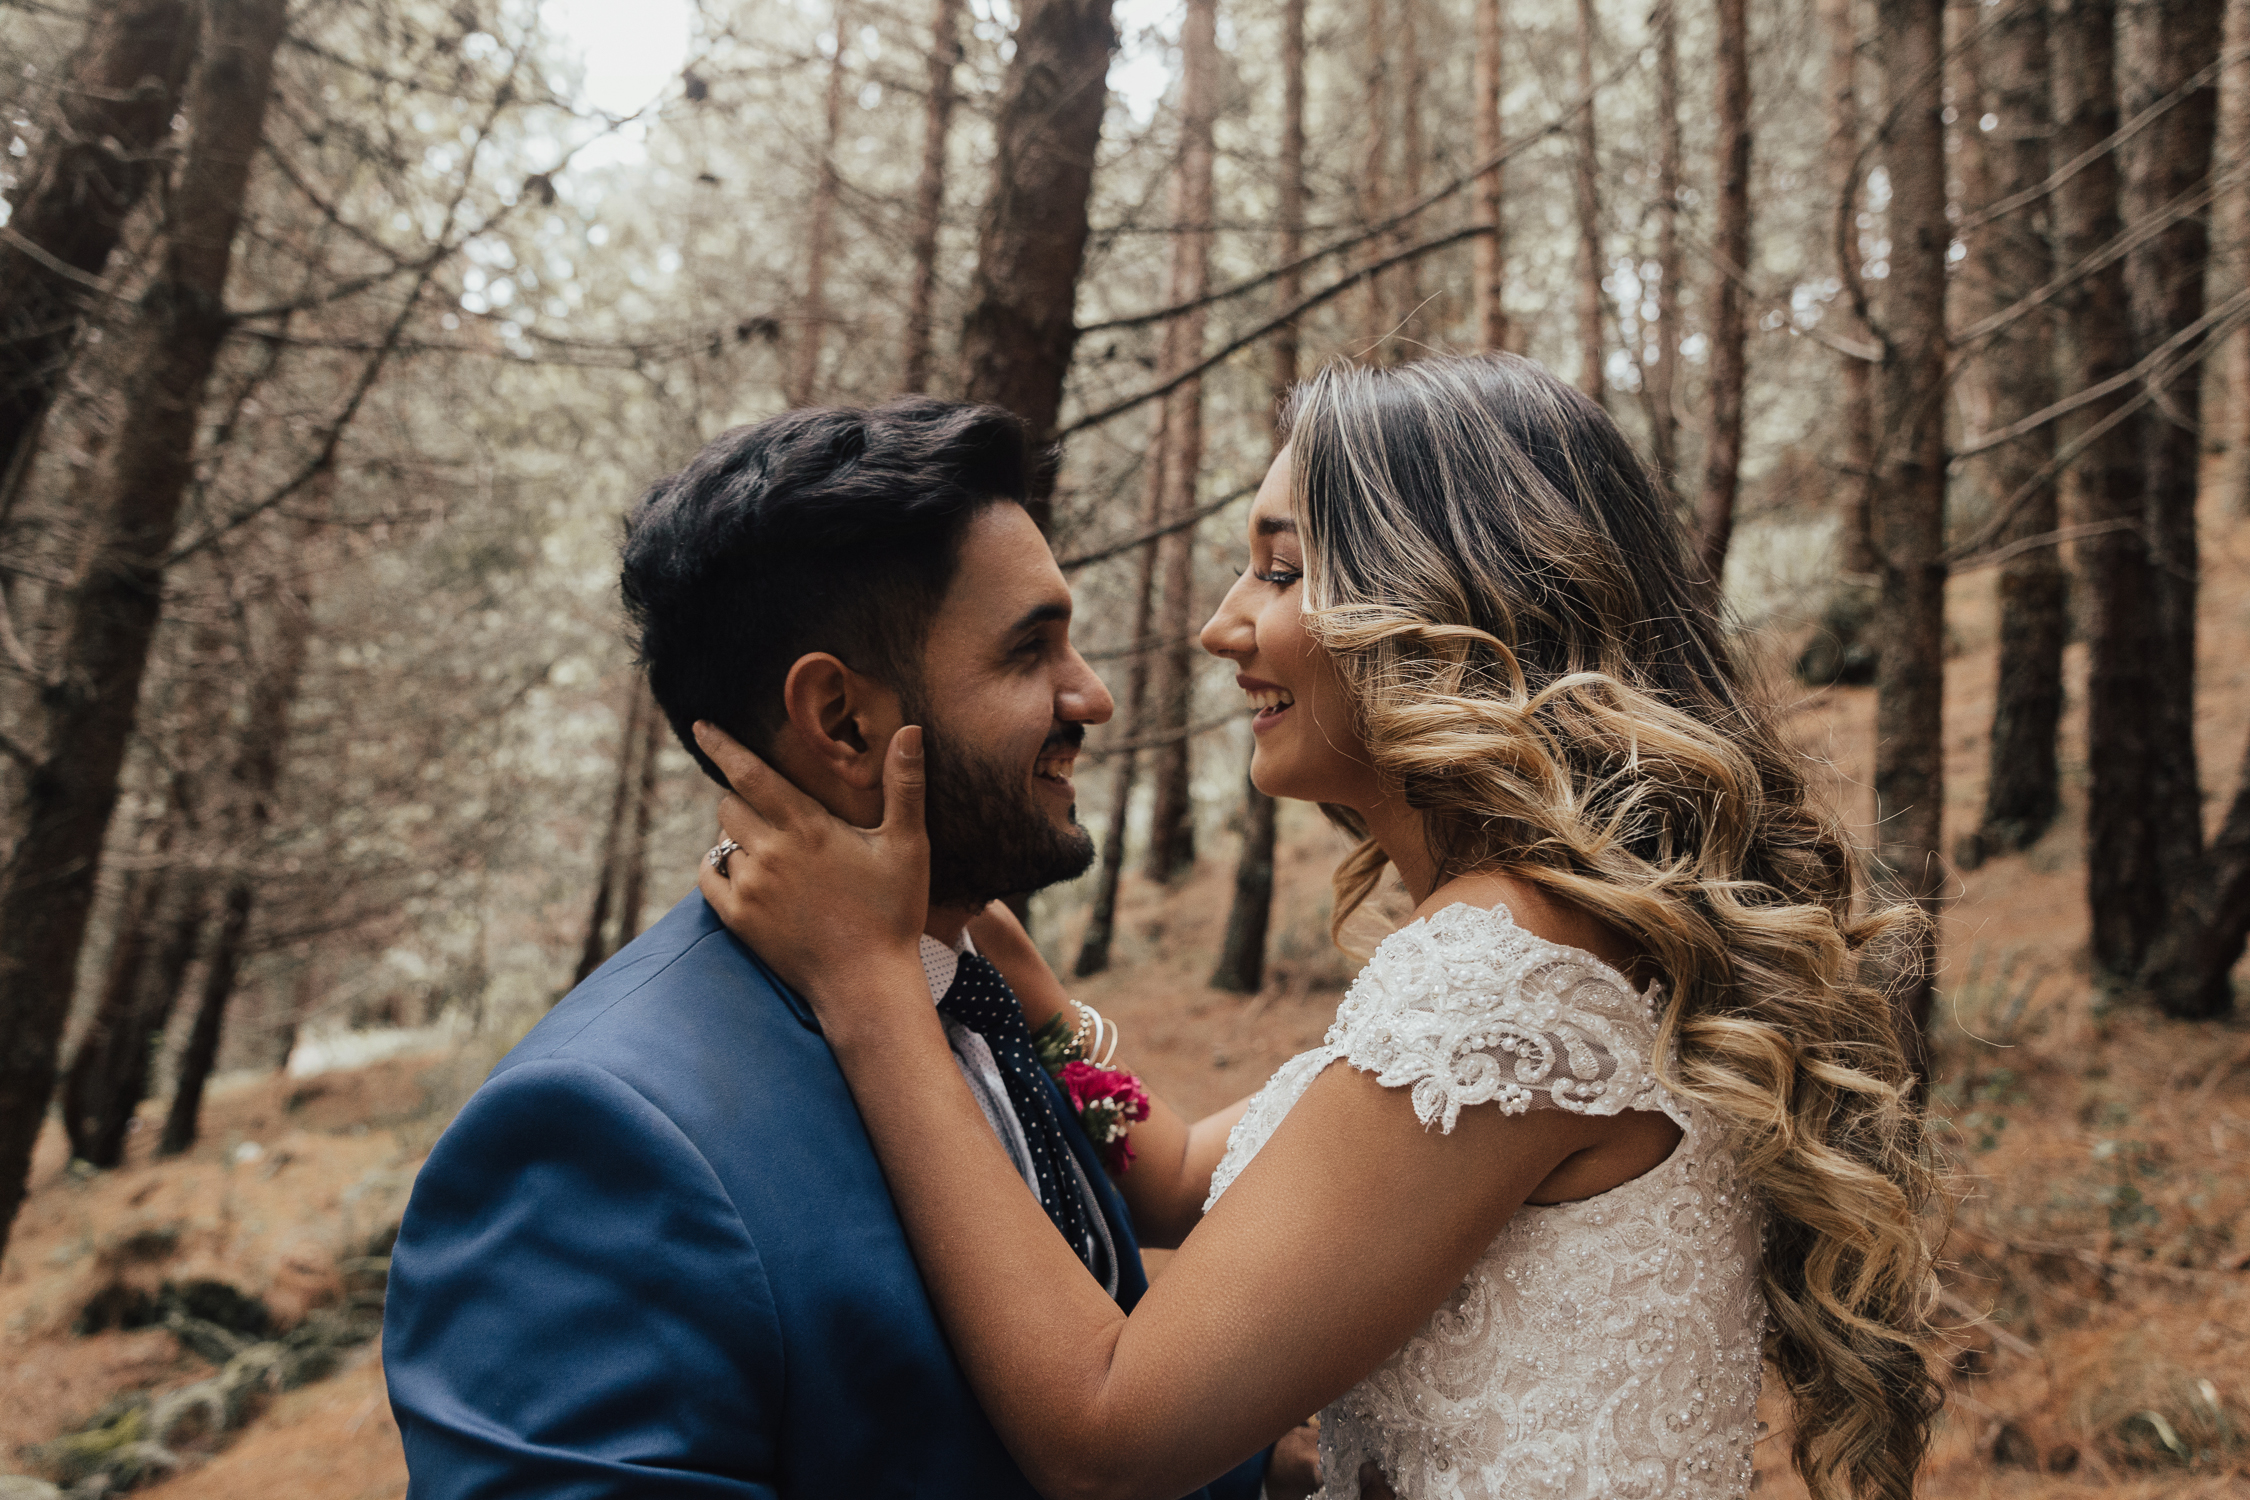 Michelle-Agurto-Fotografia-Bodas-Destination-Wedding-Photographer-Ecuador-Sesion-Johanna-Eduardo-37.JPG